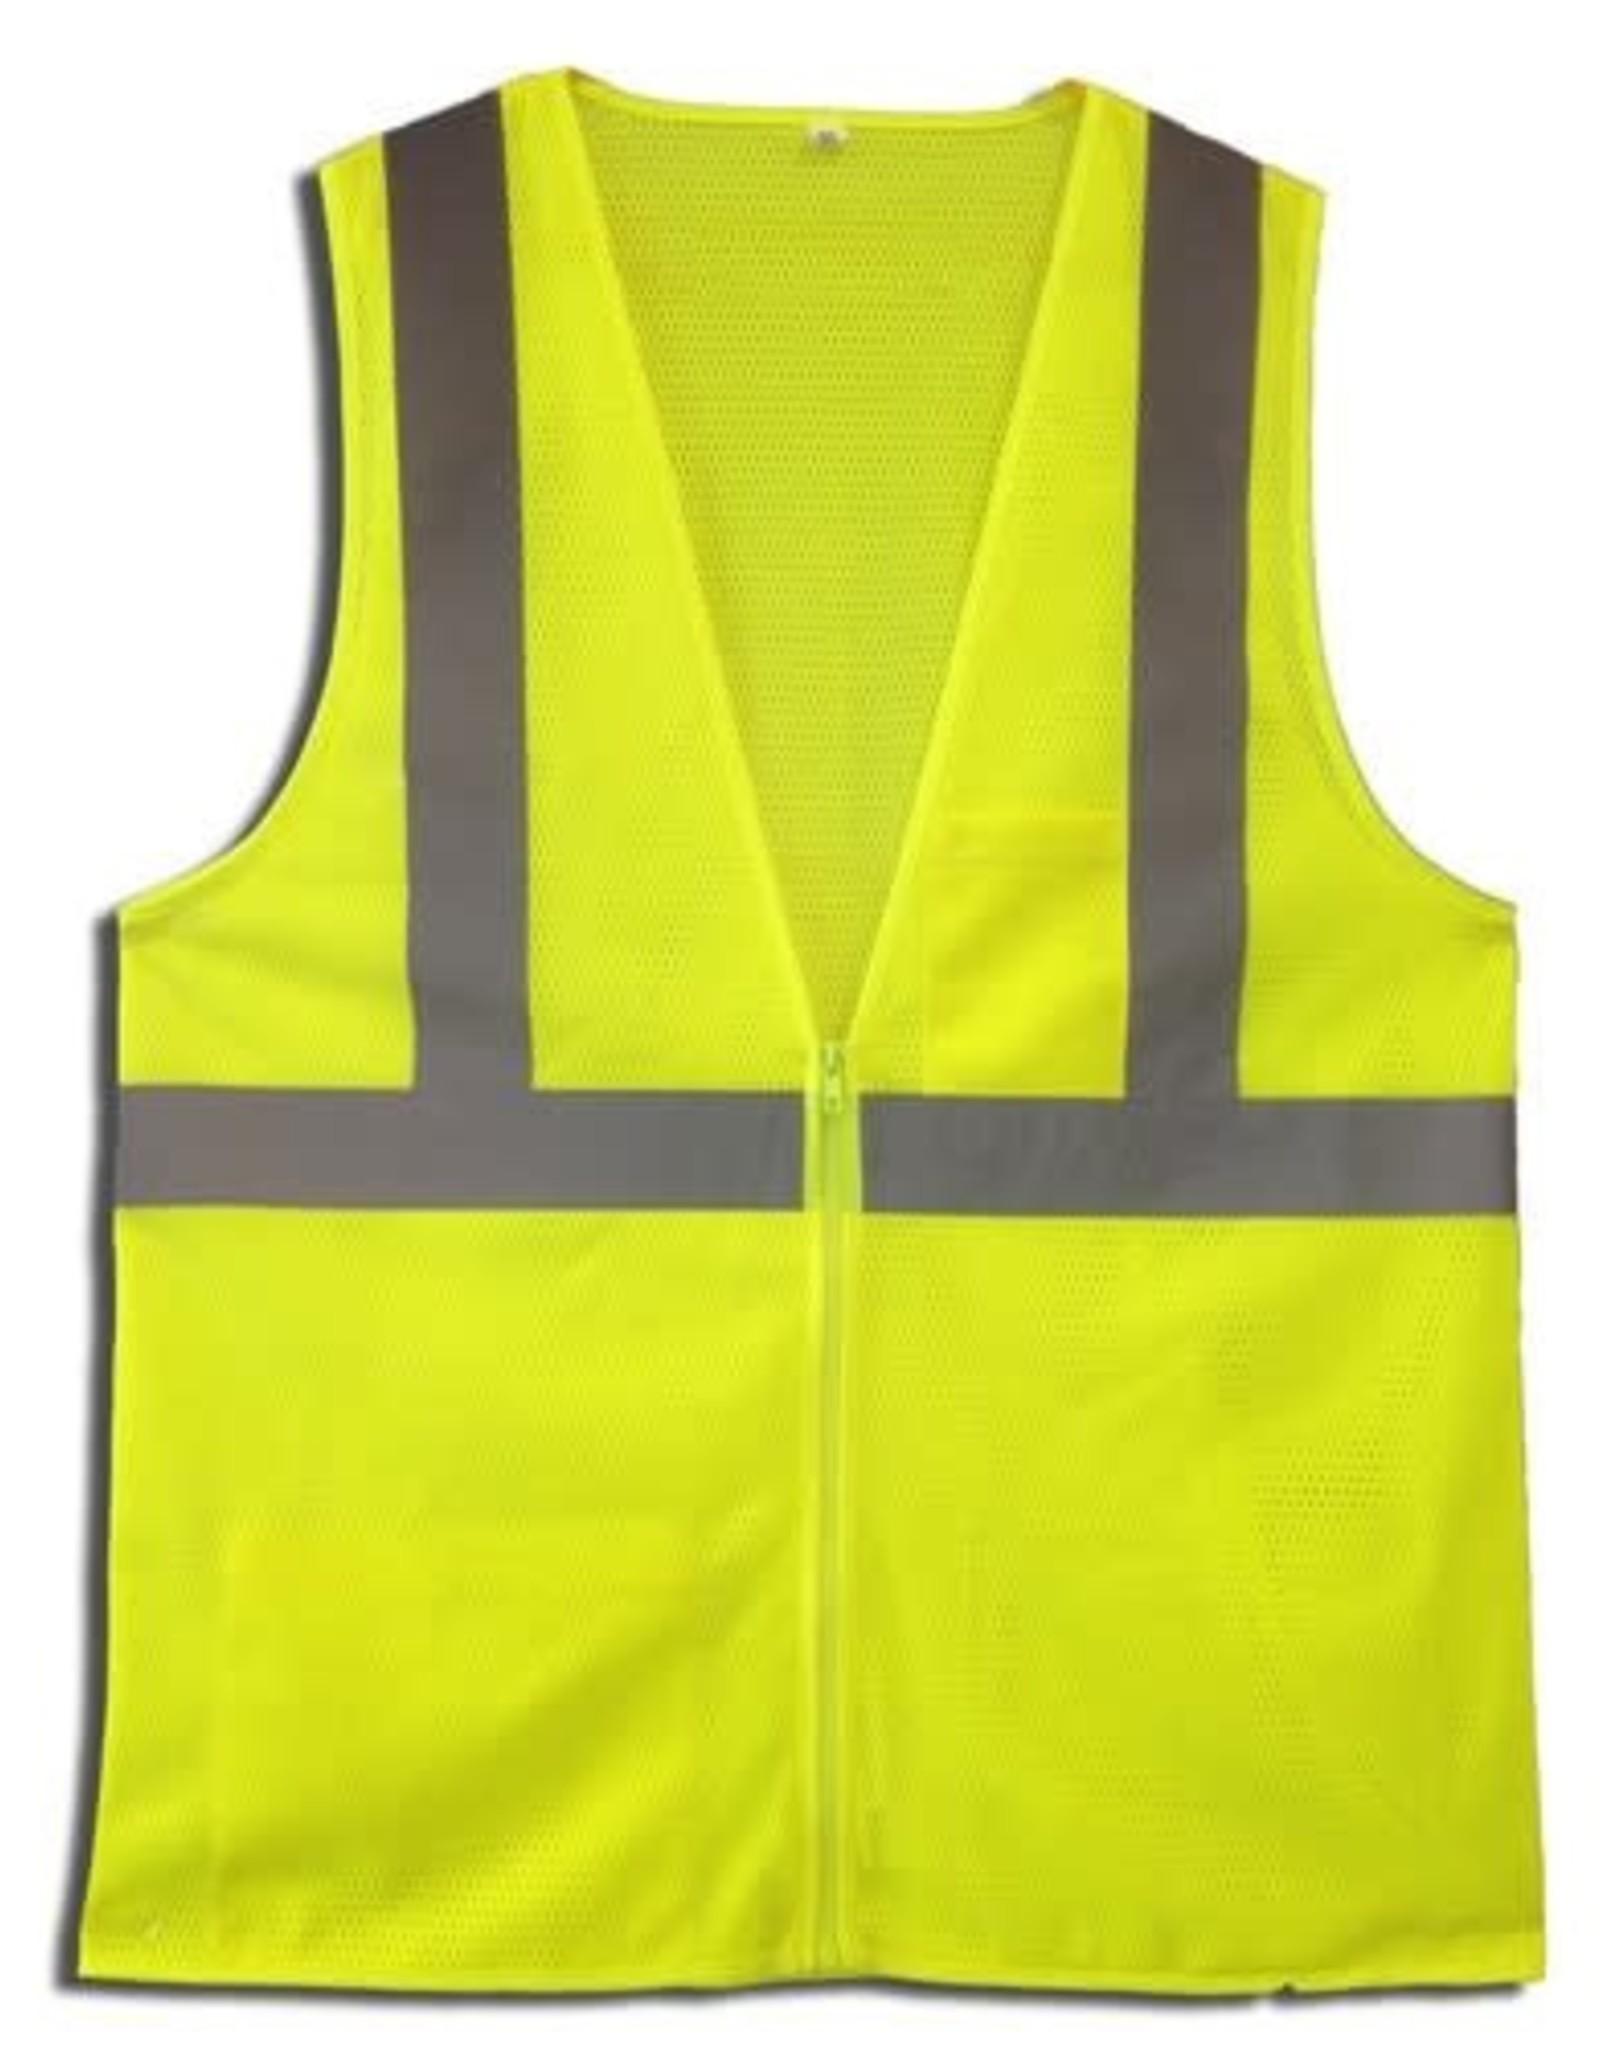 Cordova Men's Cordova Safety Vest Adult Class 2 Lime XL